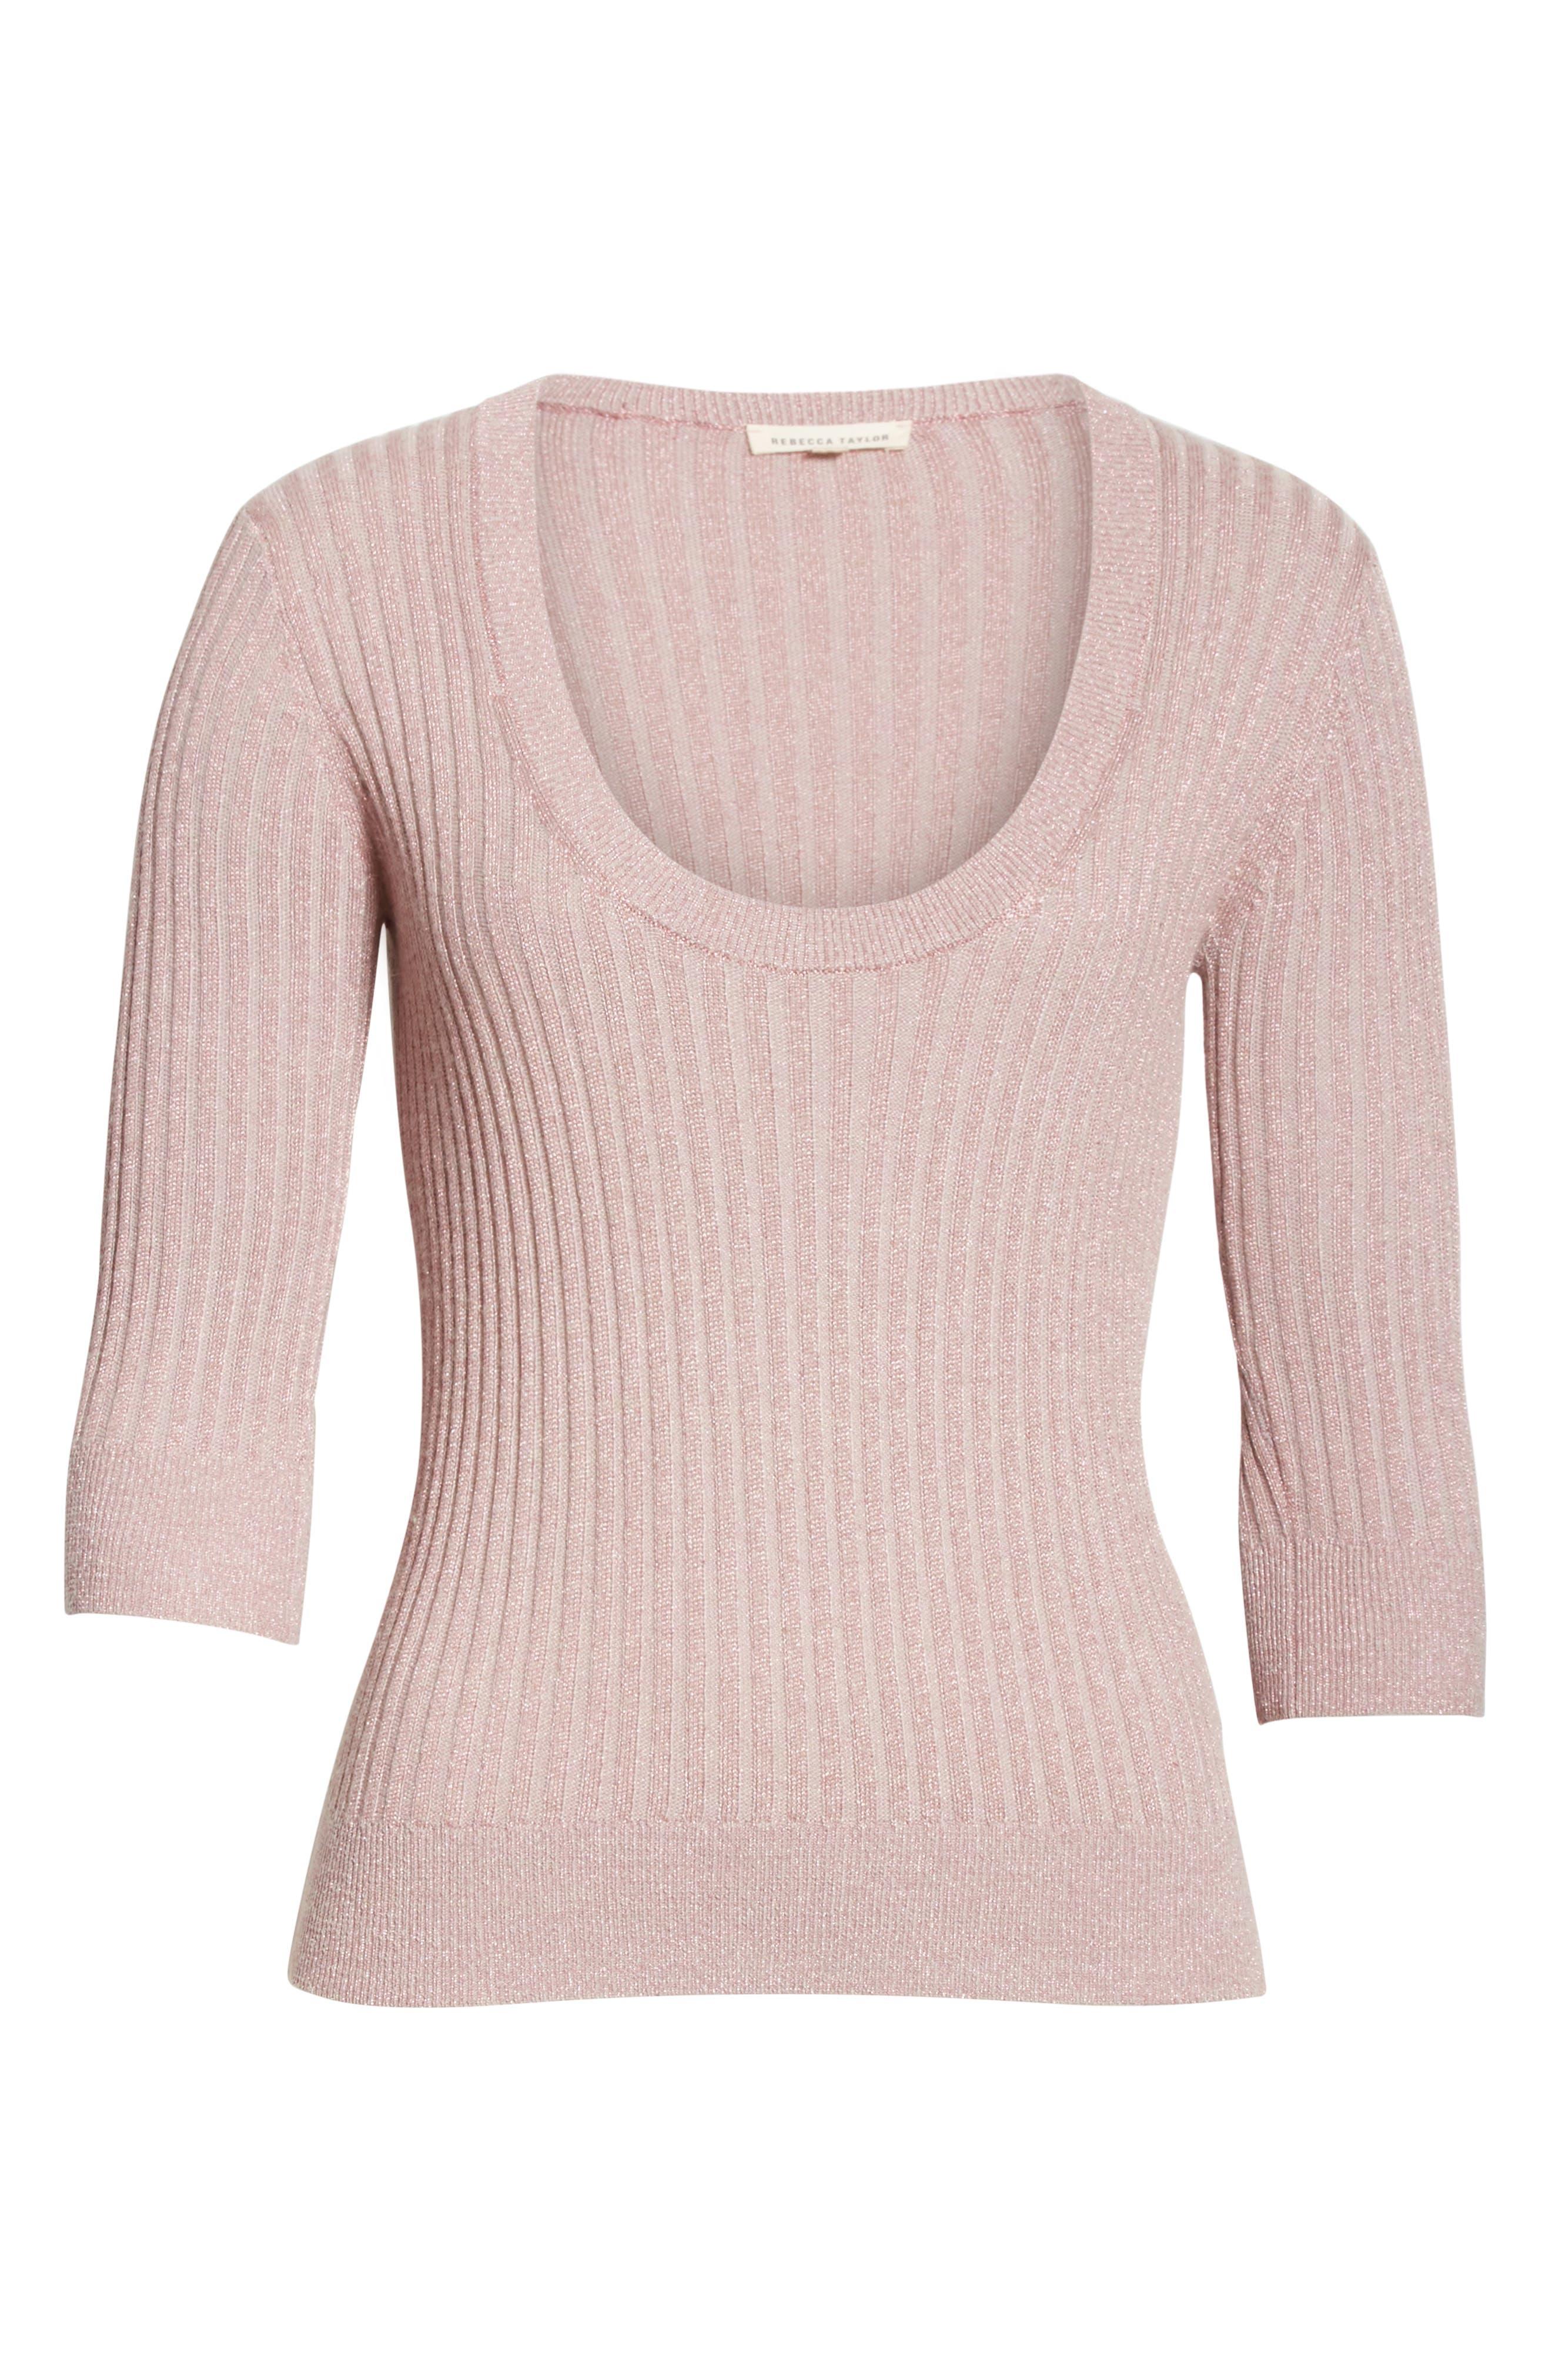 Metallic Rib Sweater,                             Alternate thumbnail 6, color,                             658